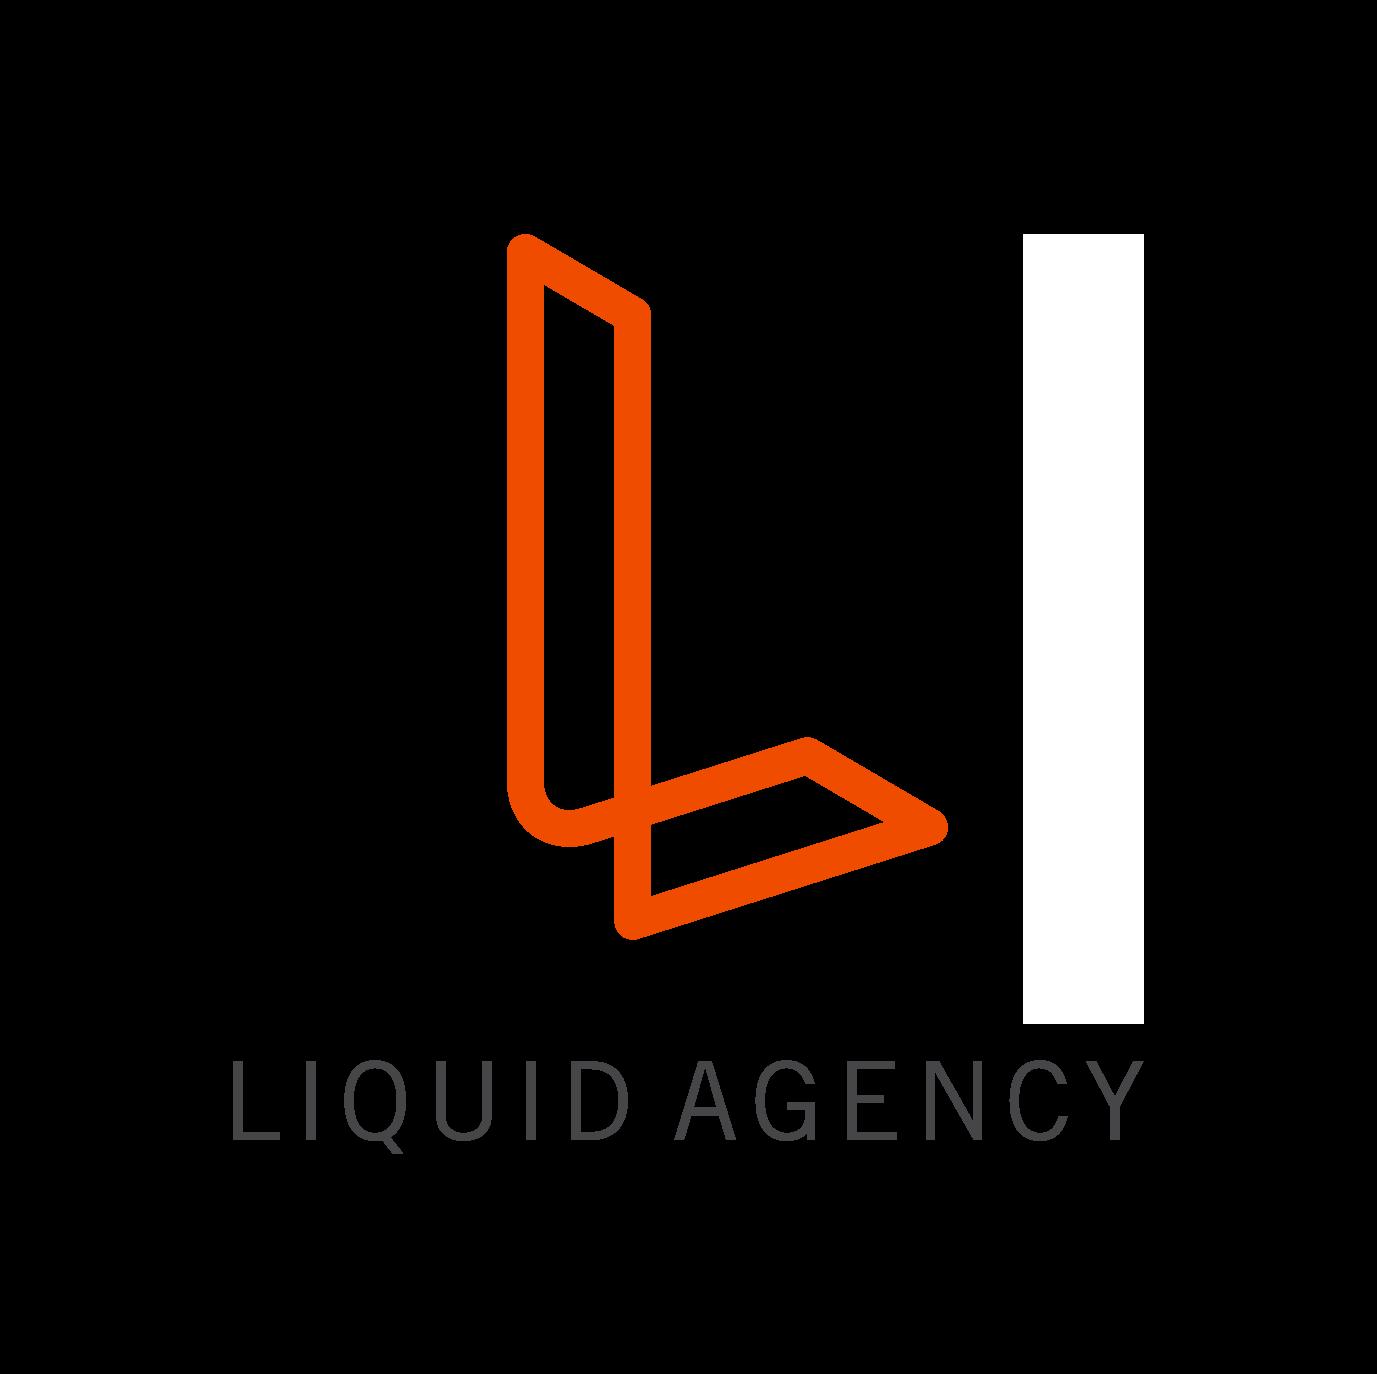 Liquid Agency on LogoLounge